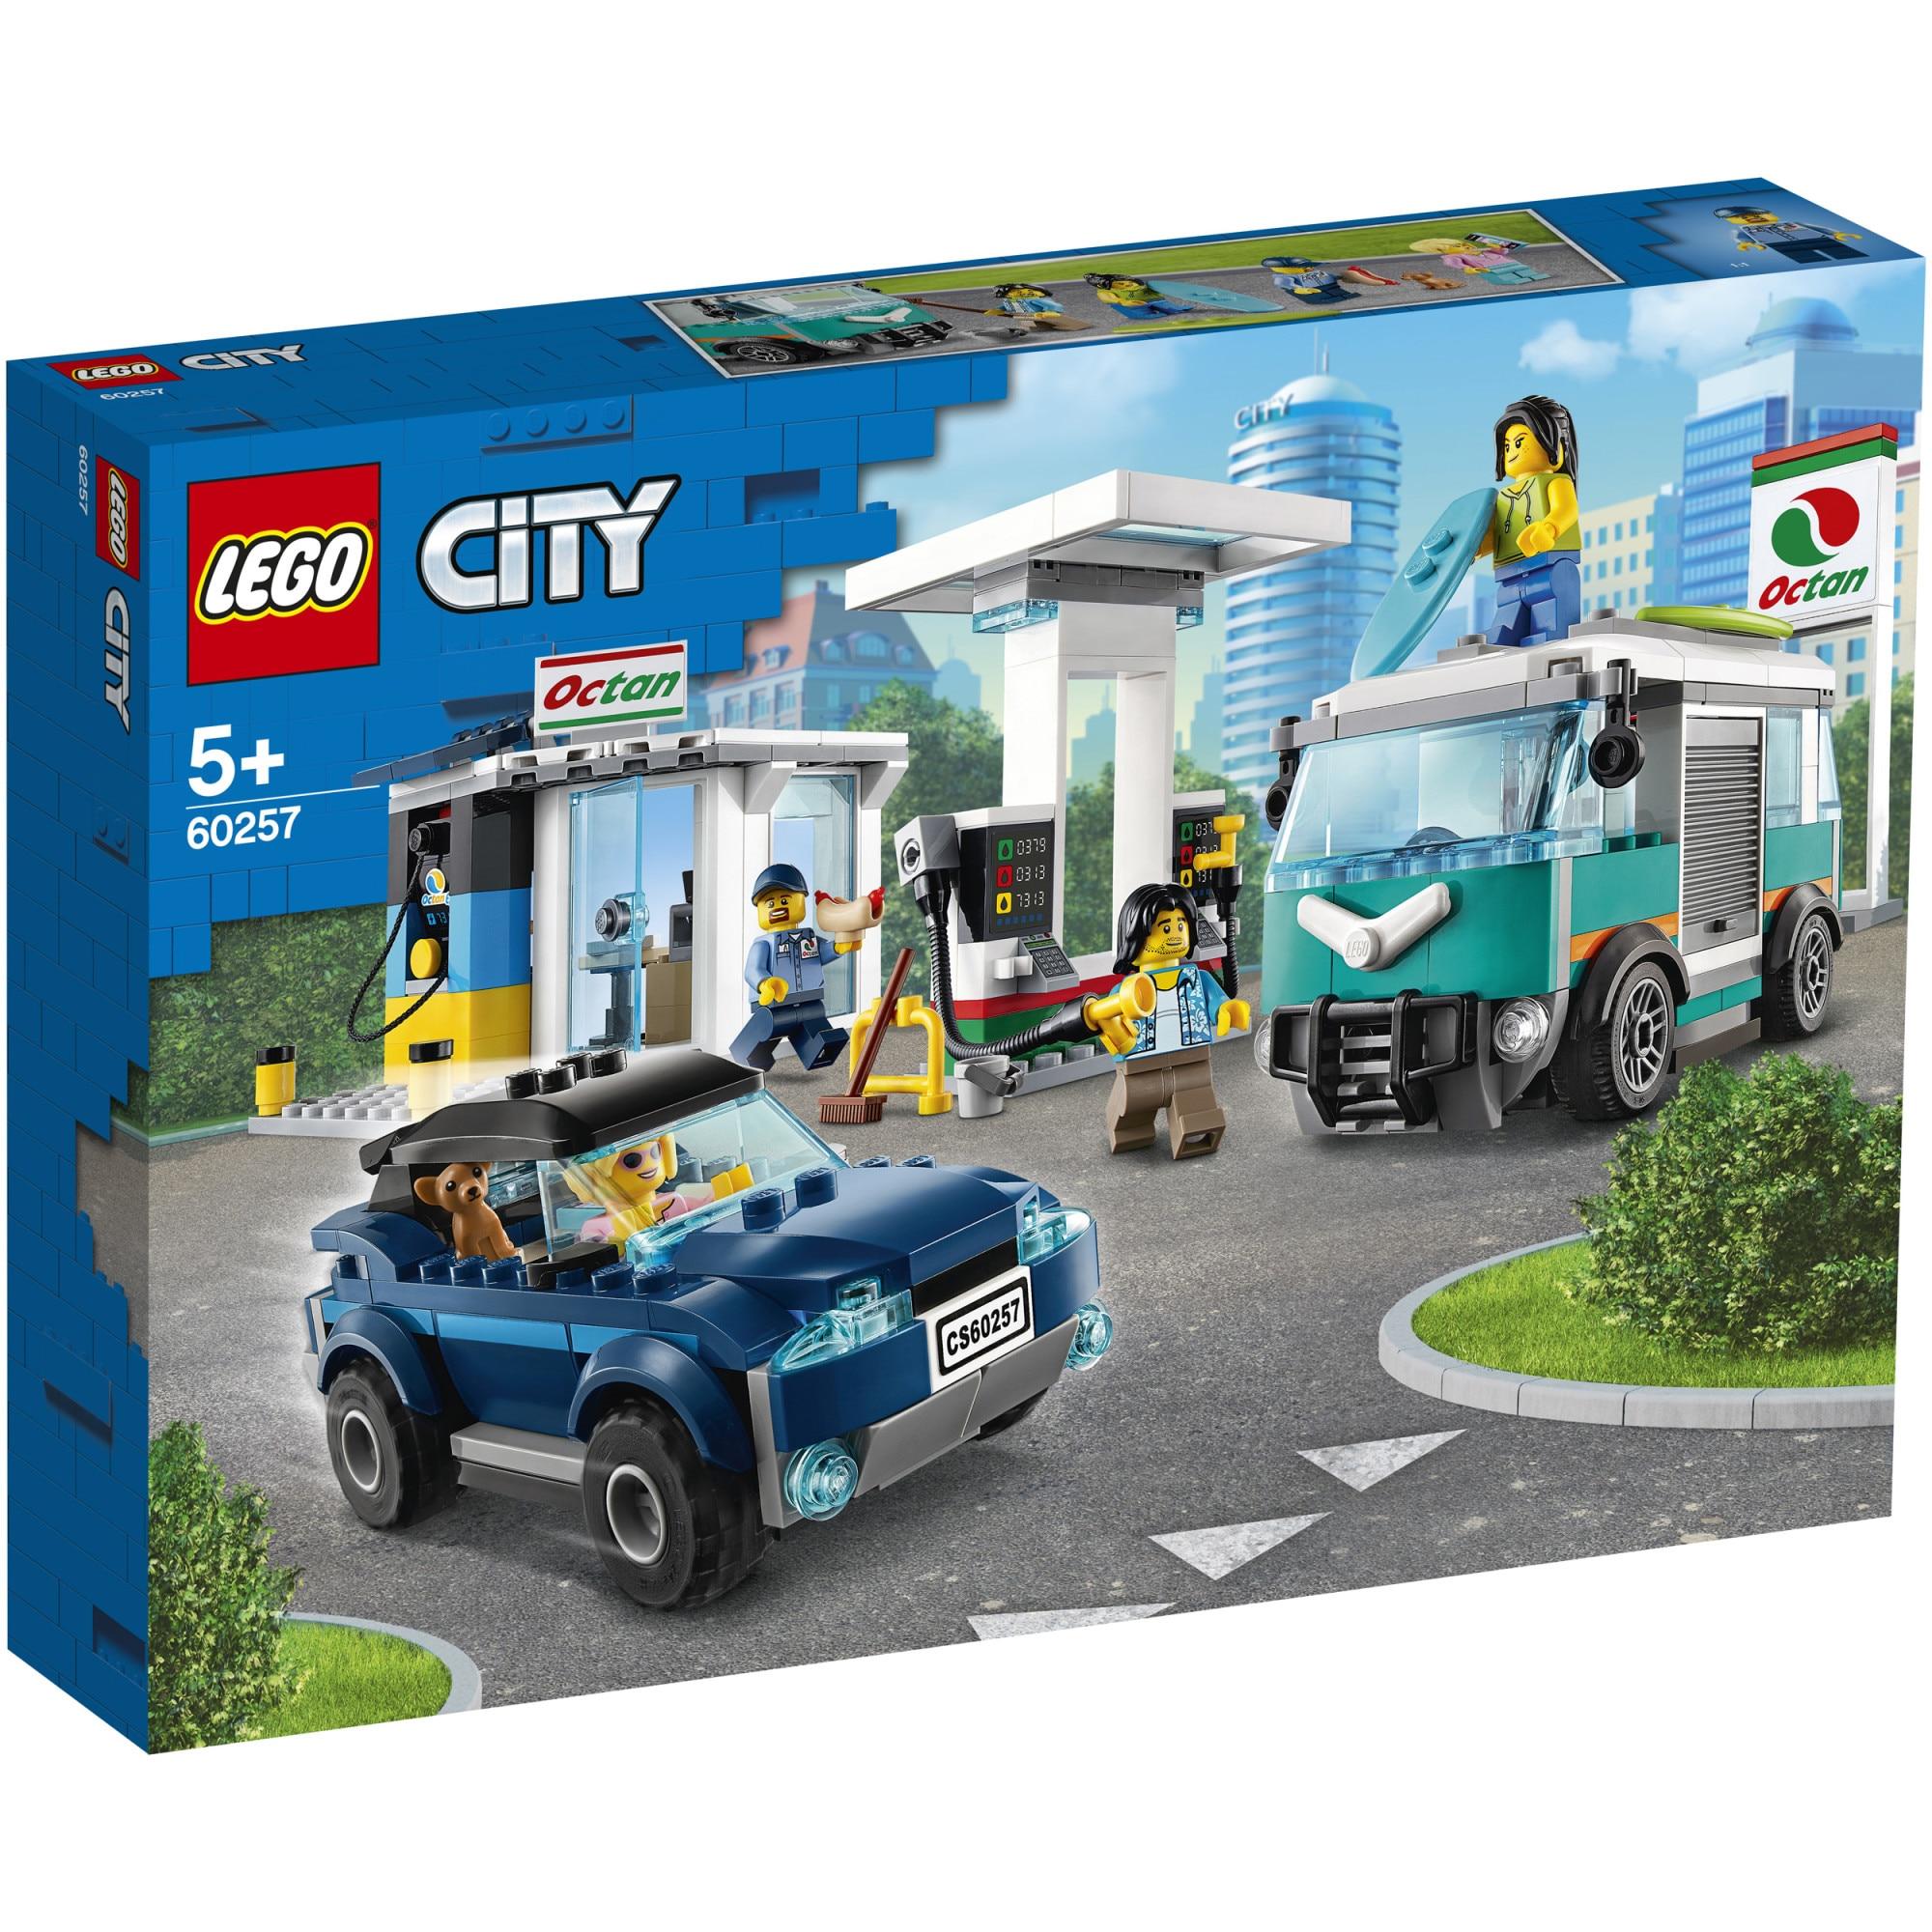 Fotografie LEGO City Nitro Wheels - Statie de service 60257, 354 piese